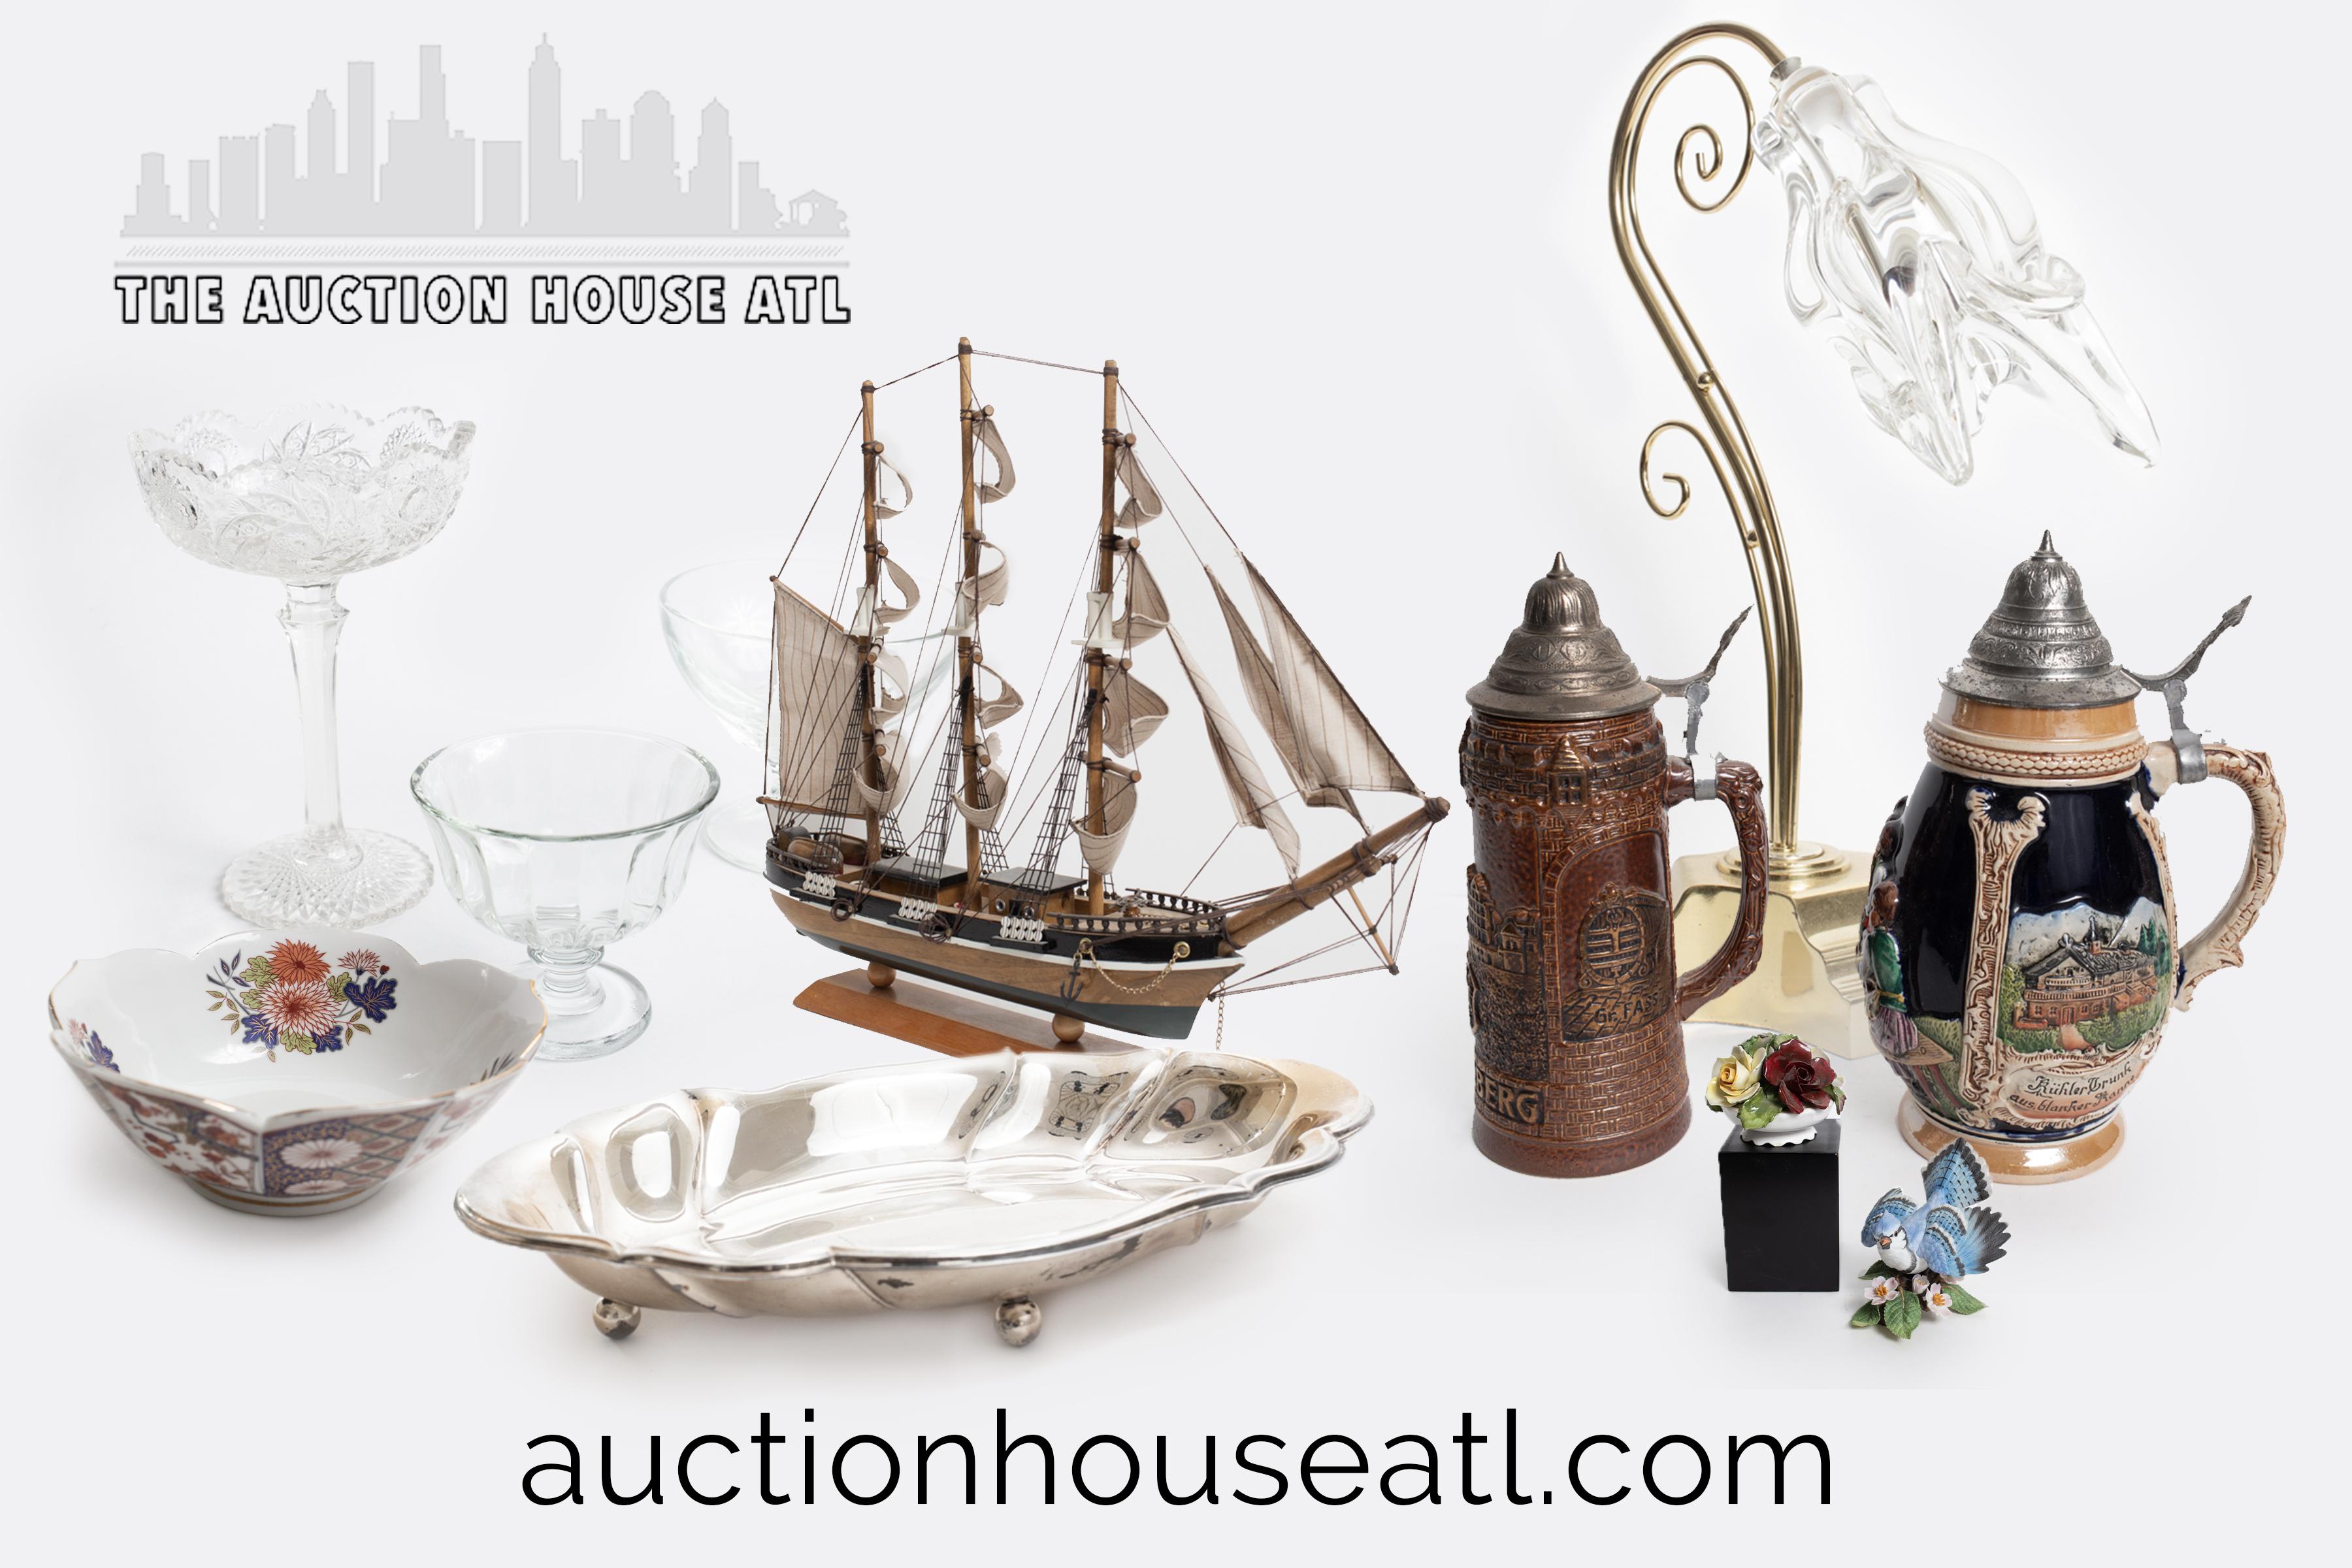 AUCTION CLOSED -Close Out High End Estate Auction – Antiques, Collectibles, Art, Home Decor, Silver, Designer Accessories & More